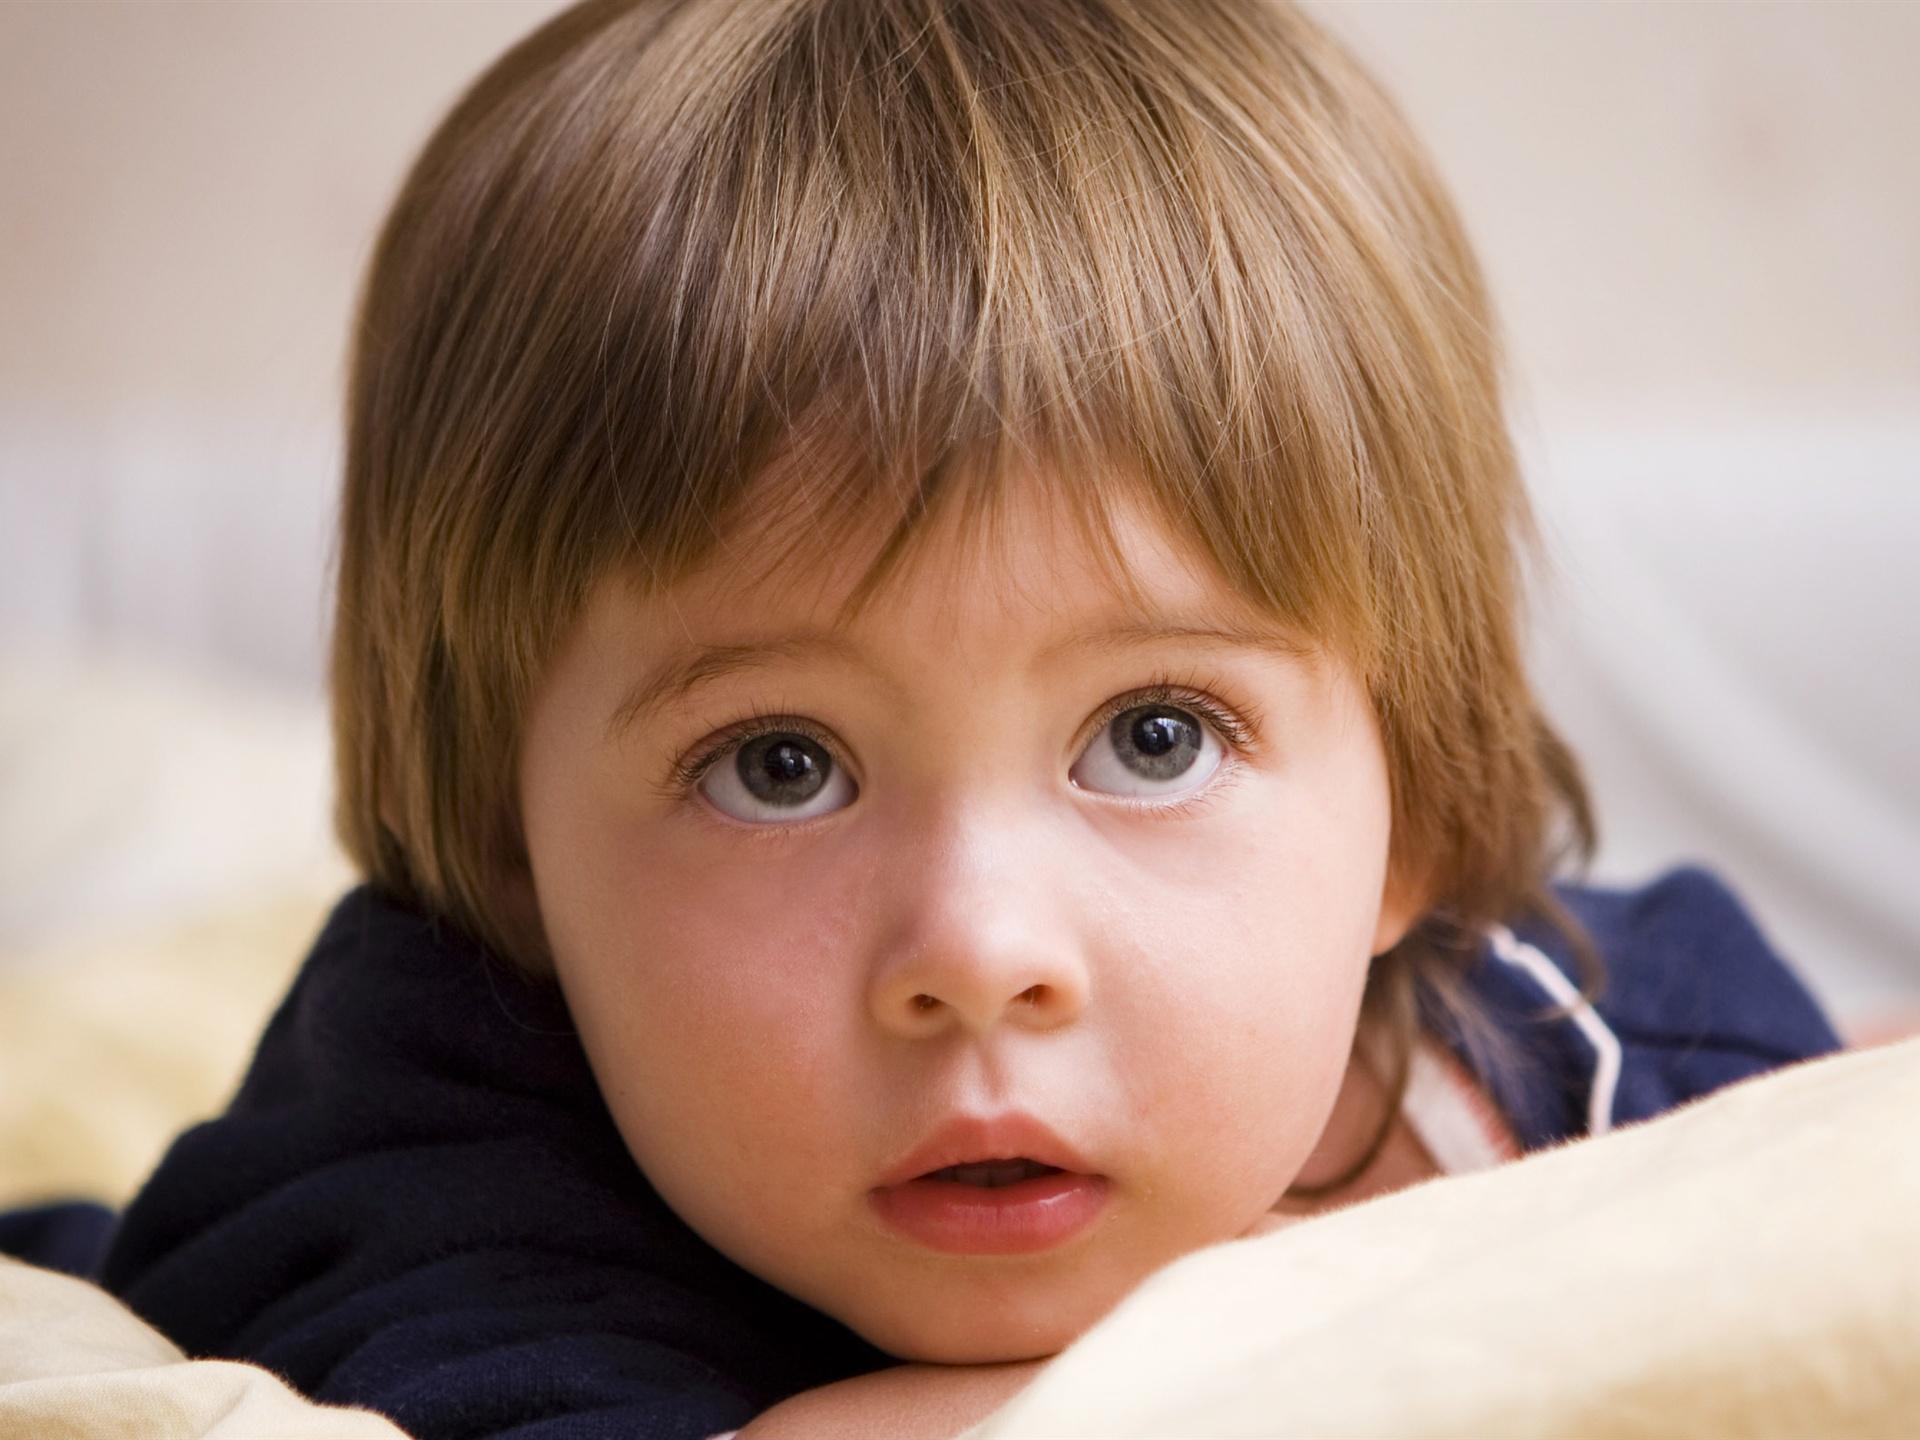 Wallpaper Cute Little Boy 2560x1600 Hd Picture Image